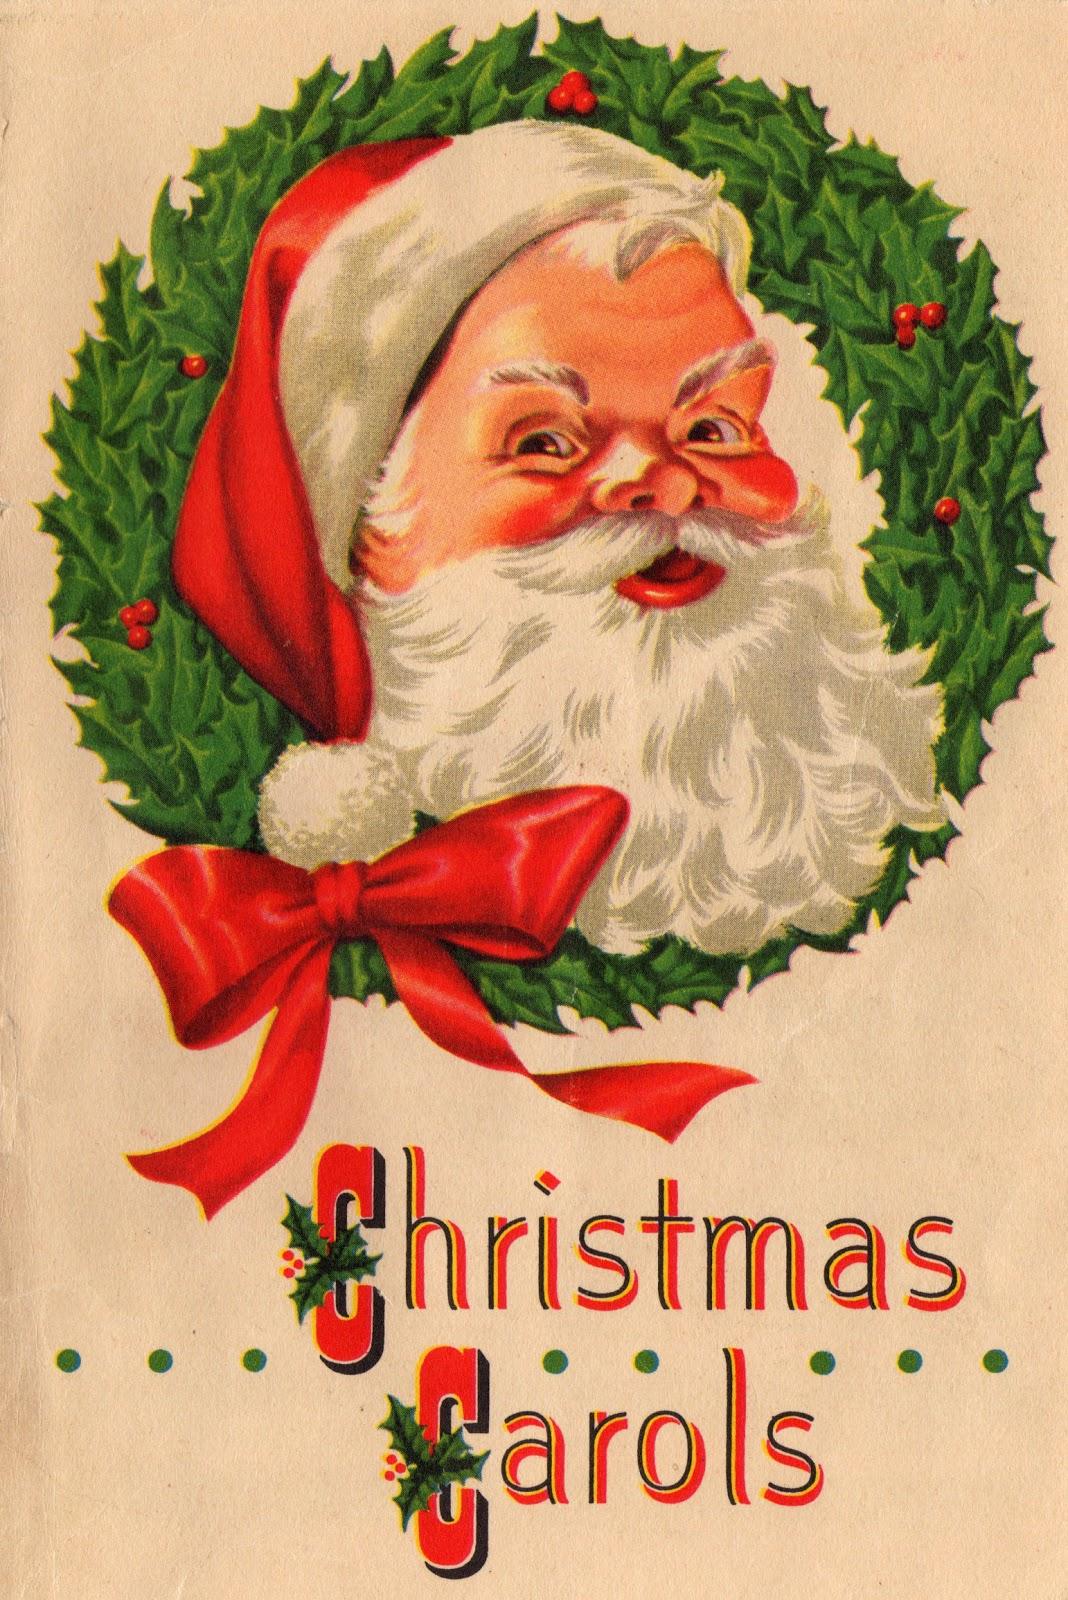 christmas carols for children's choir lyrics